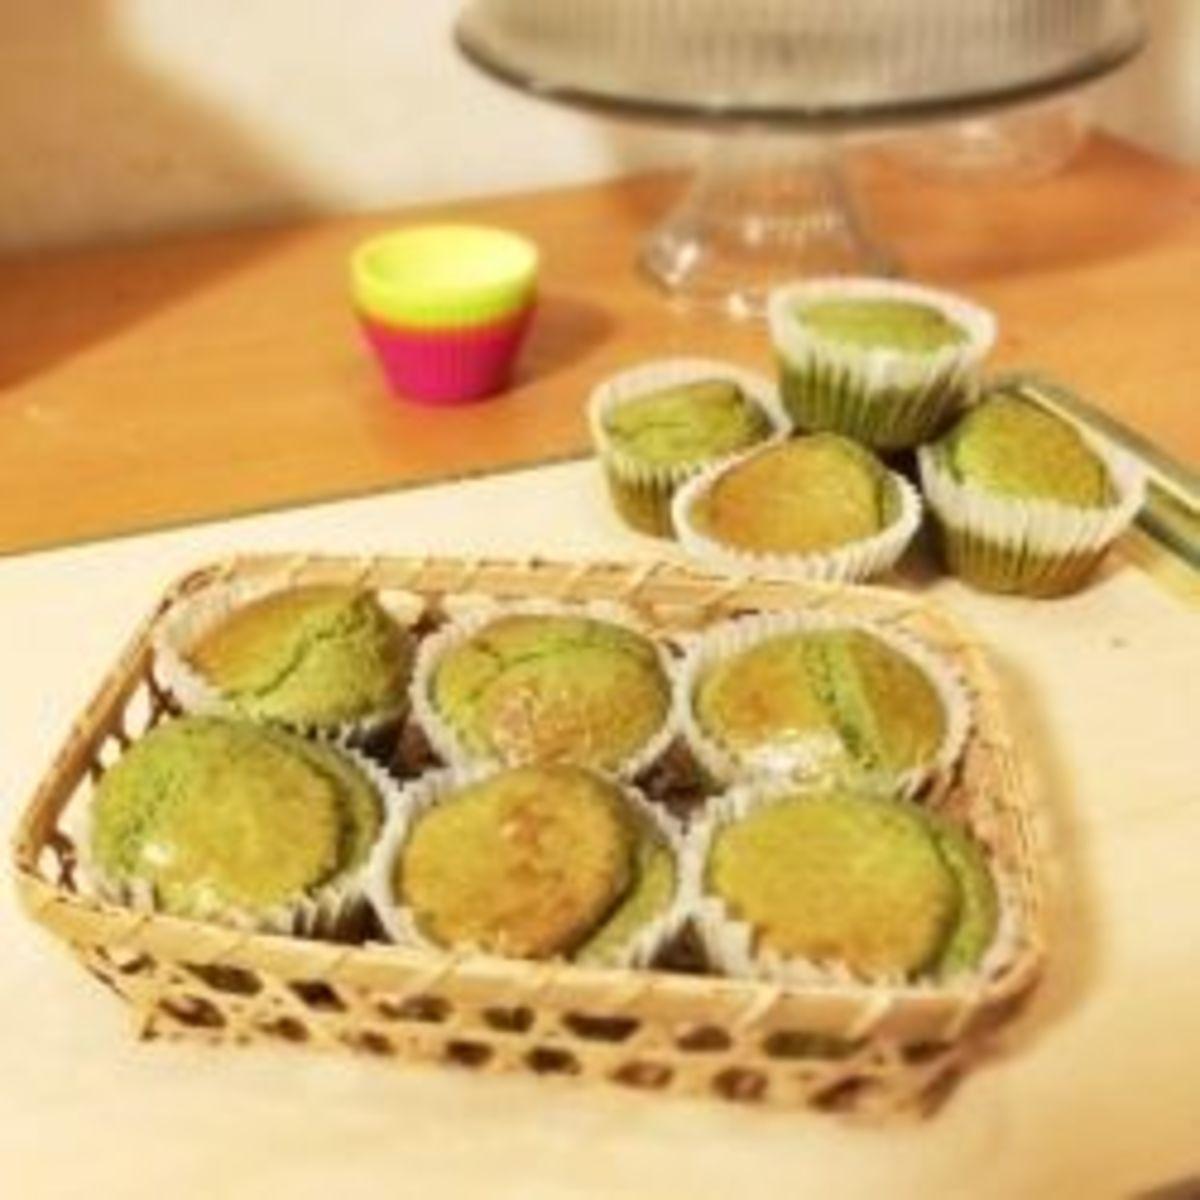 Sugar Free & Gluten Free Low Carb Matcha Muffins